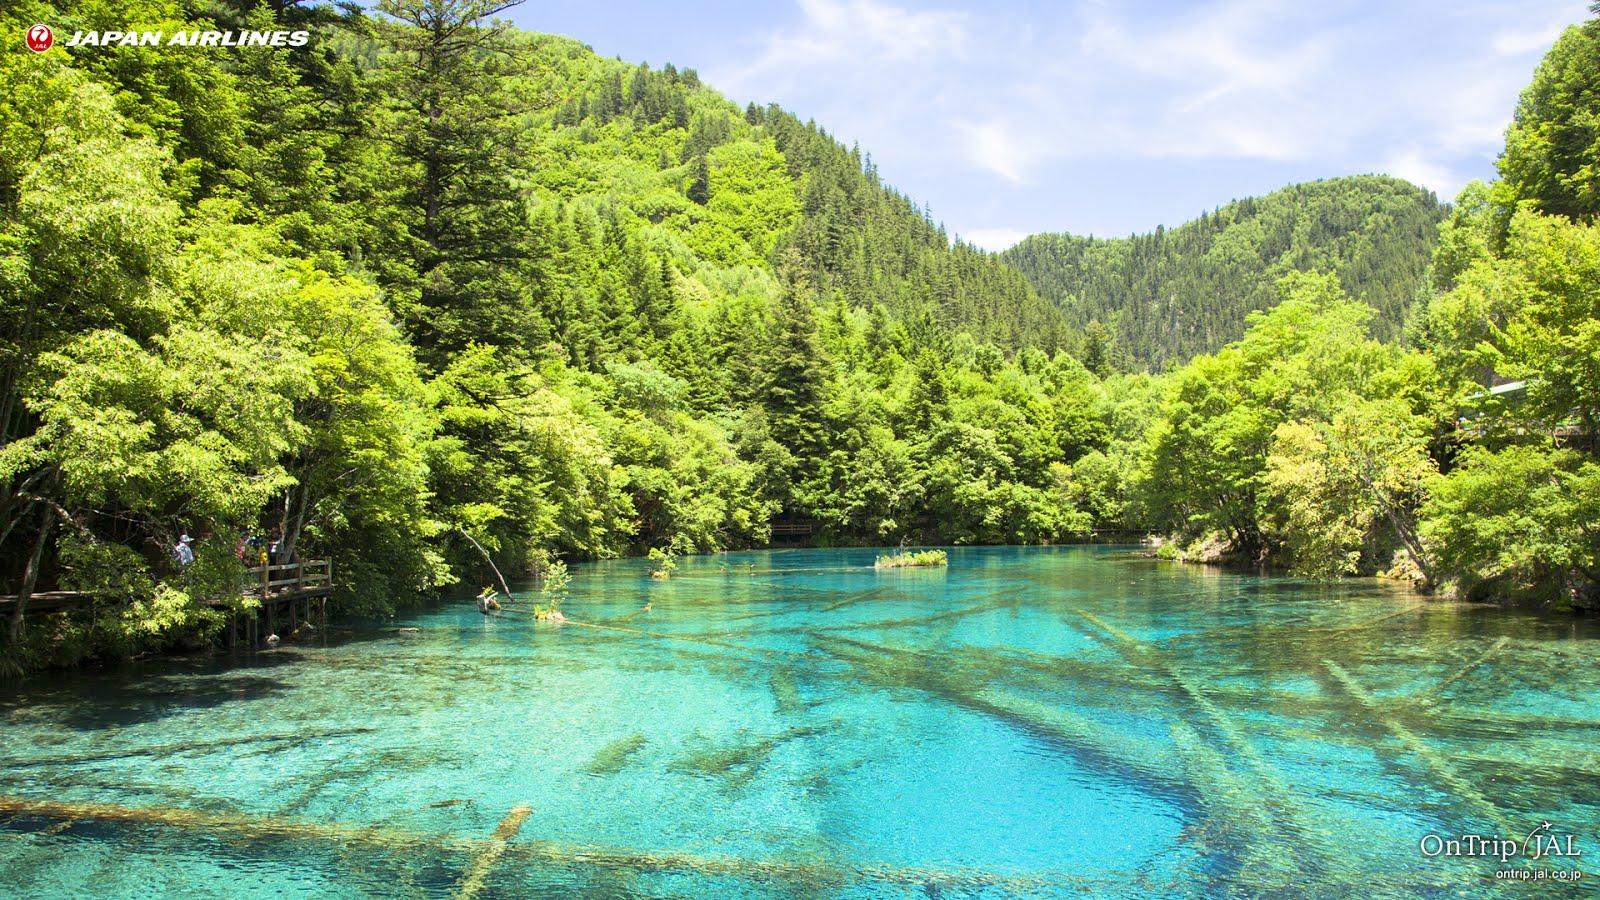 @ JAL旅プラスなび⊙絶景-景色 每月更新ダウンロード ~ 海外 幽玄の美・九寨溝